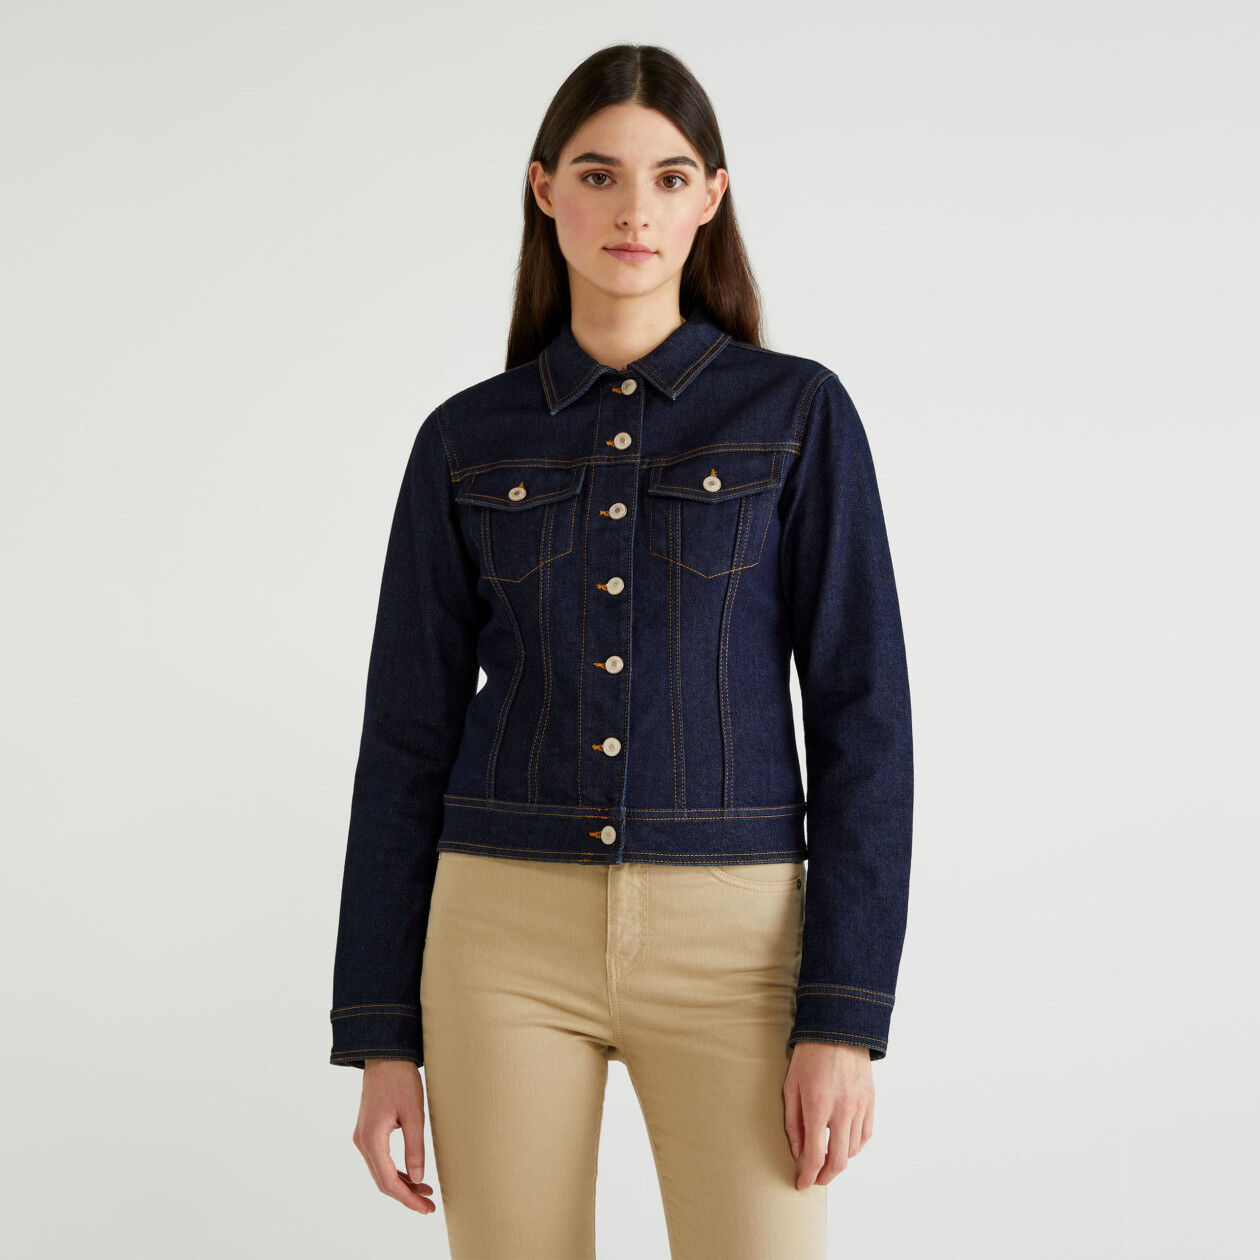 Jacke aus stretchigem Denim